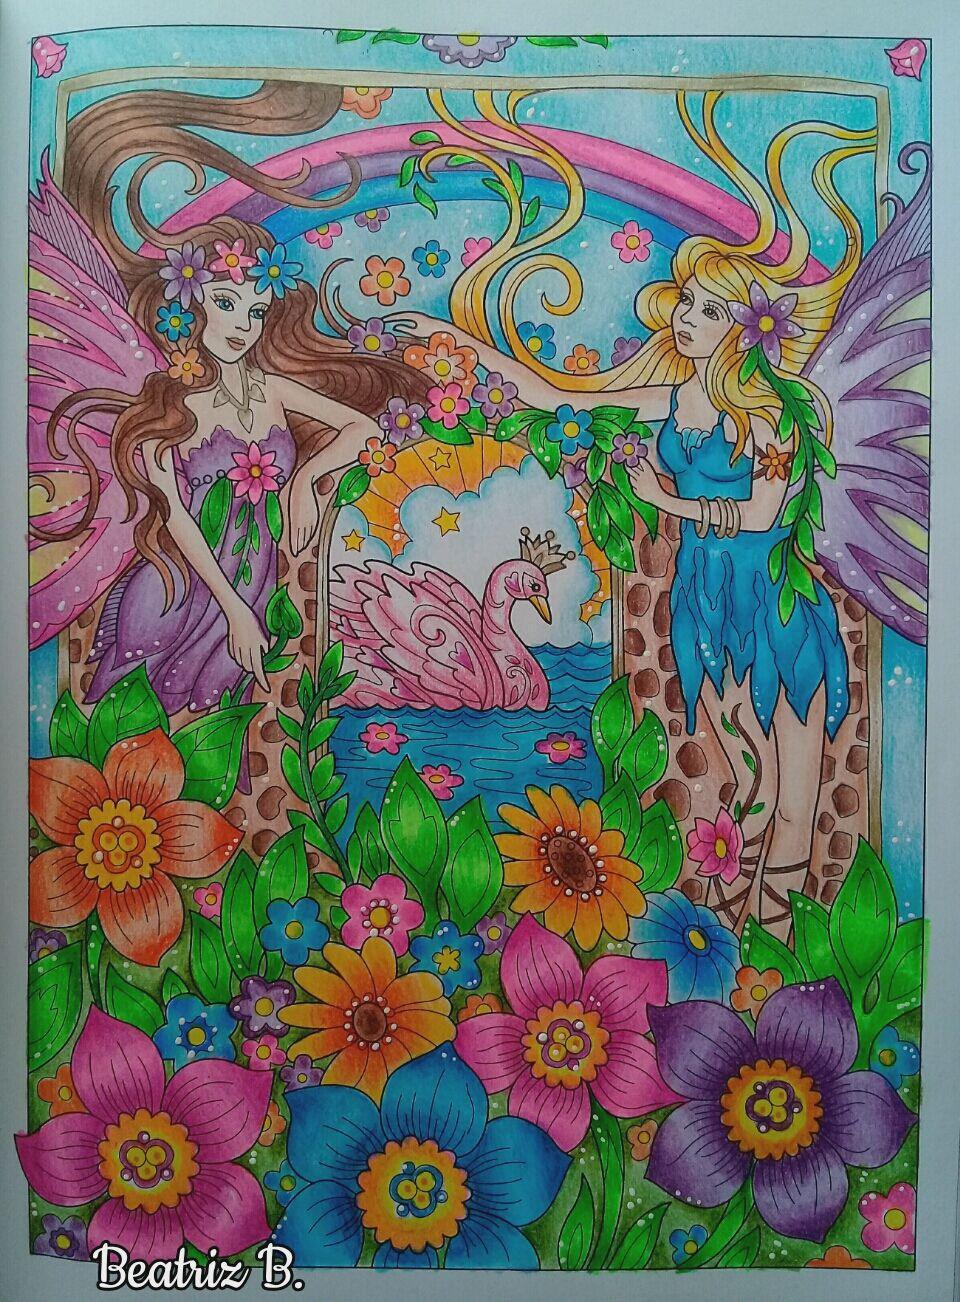 magical fairies marjorie sarnat art in 2019 fairy coloring coloring books color me beautiful. Black Bedroom Furniture Sets. Home Design Ideas